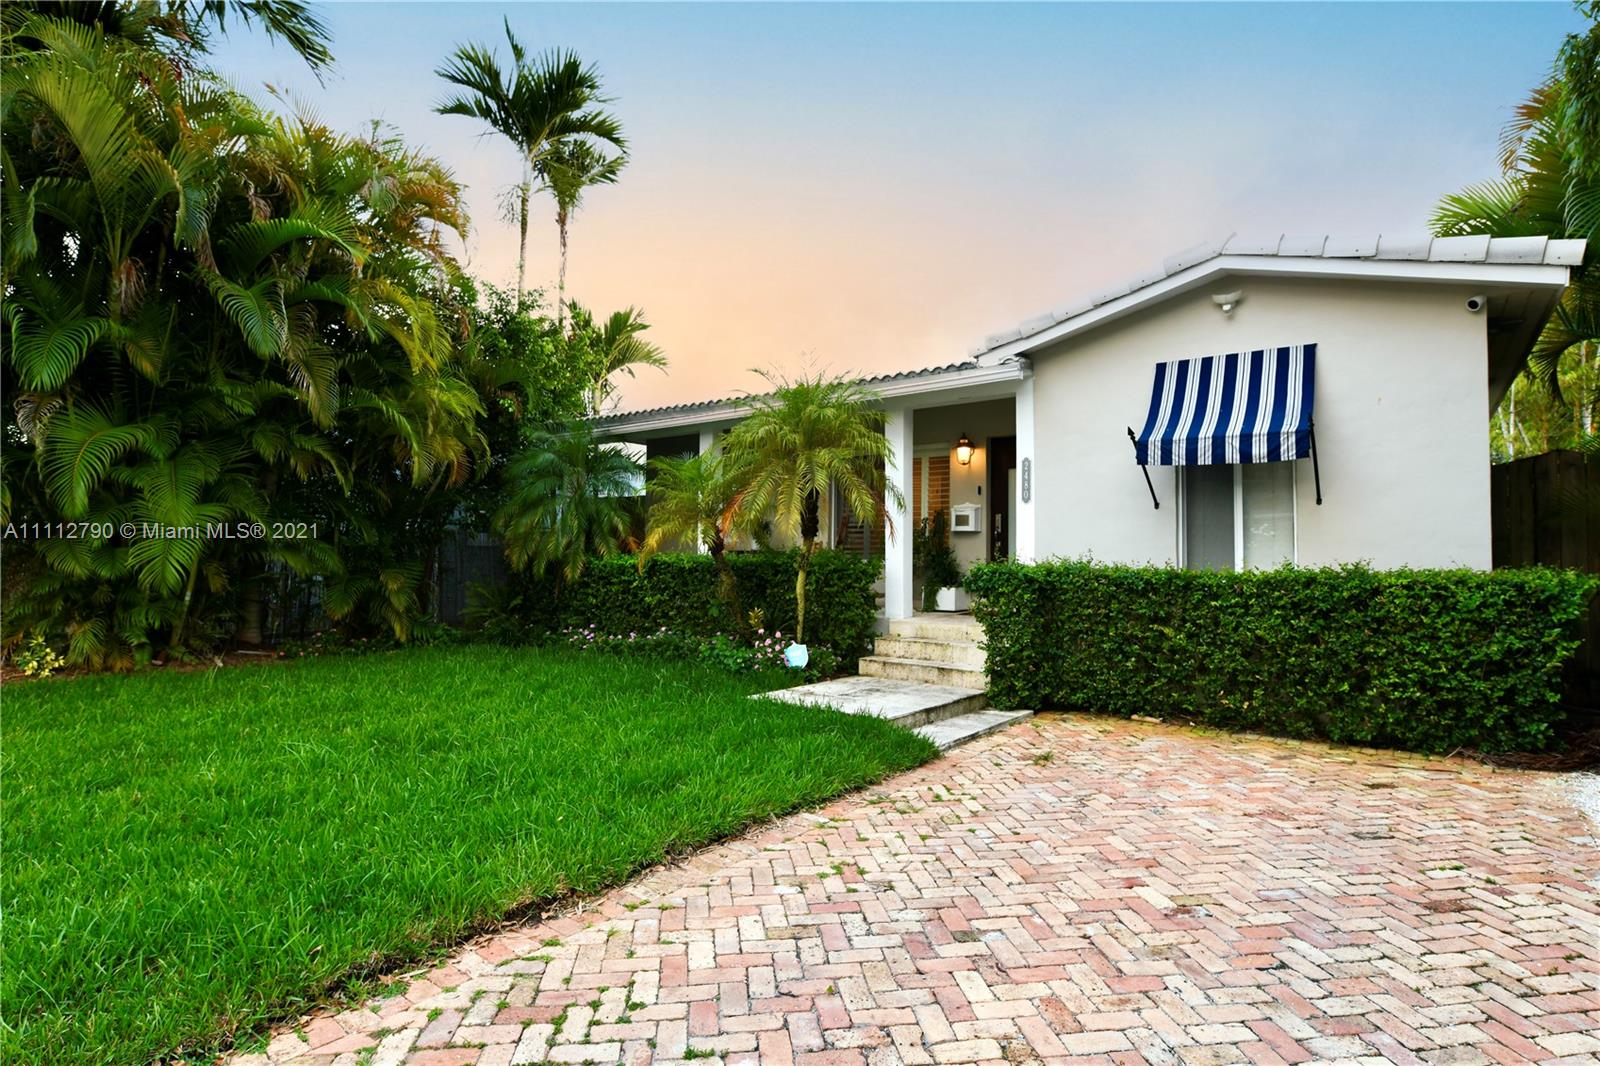 Silver Bluff - 2480 SW 23rd St, Miami, FL 33145